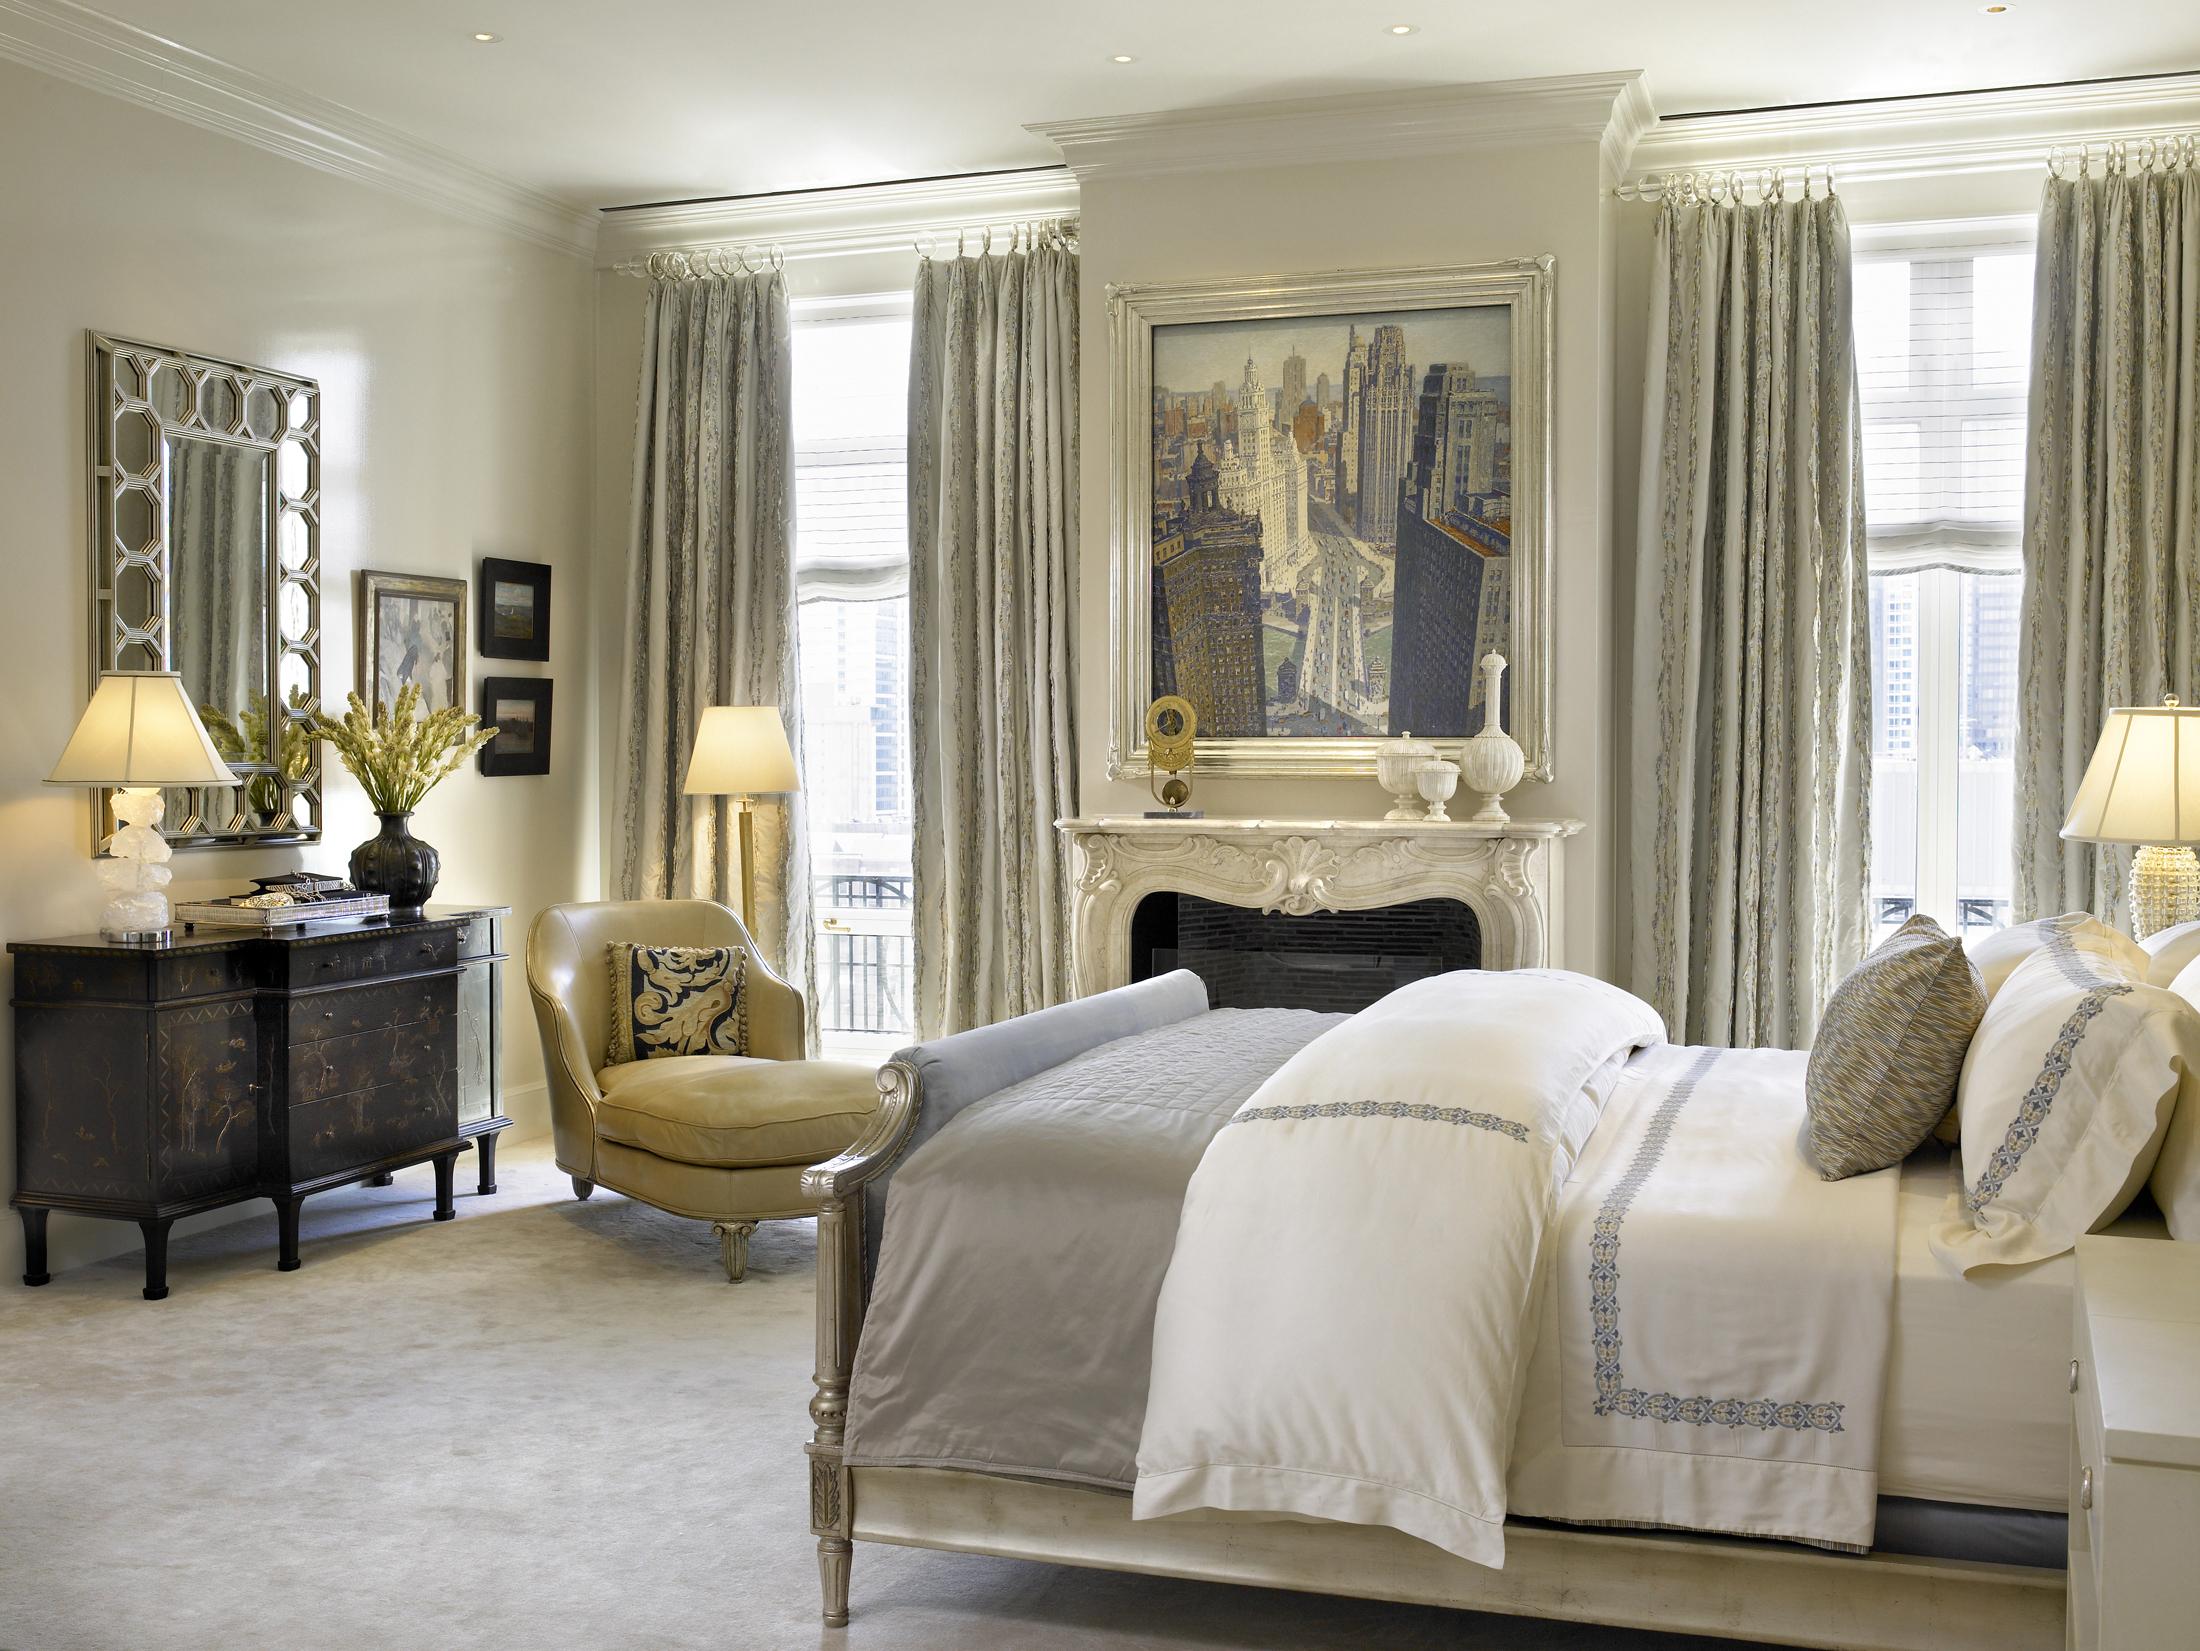 Private Collector | Design Firm: Jessica Lagrange Interiors Artist: J. Jeffrey Grant